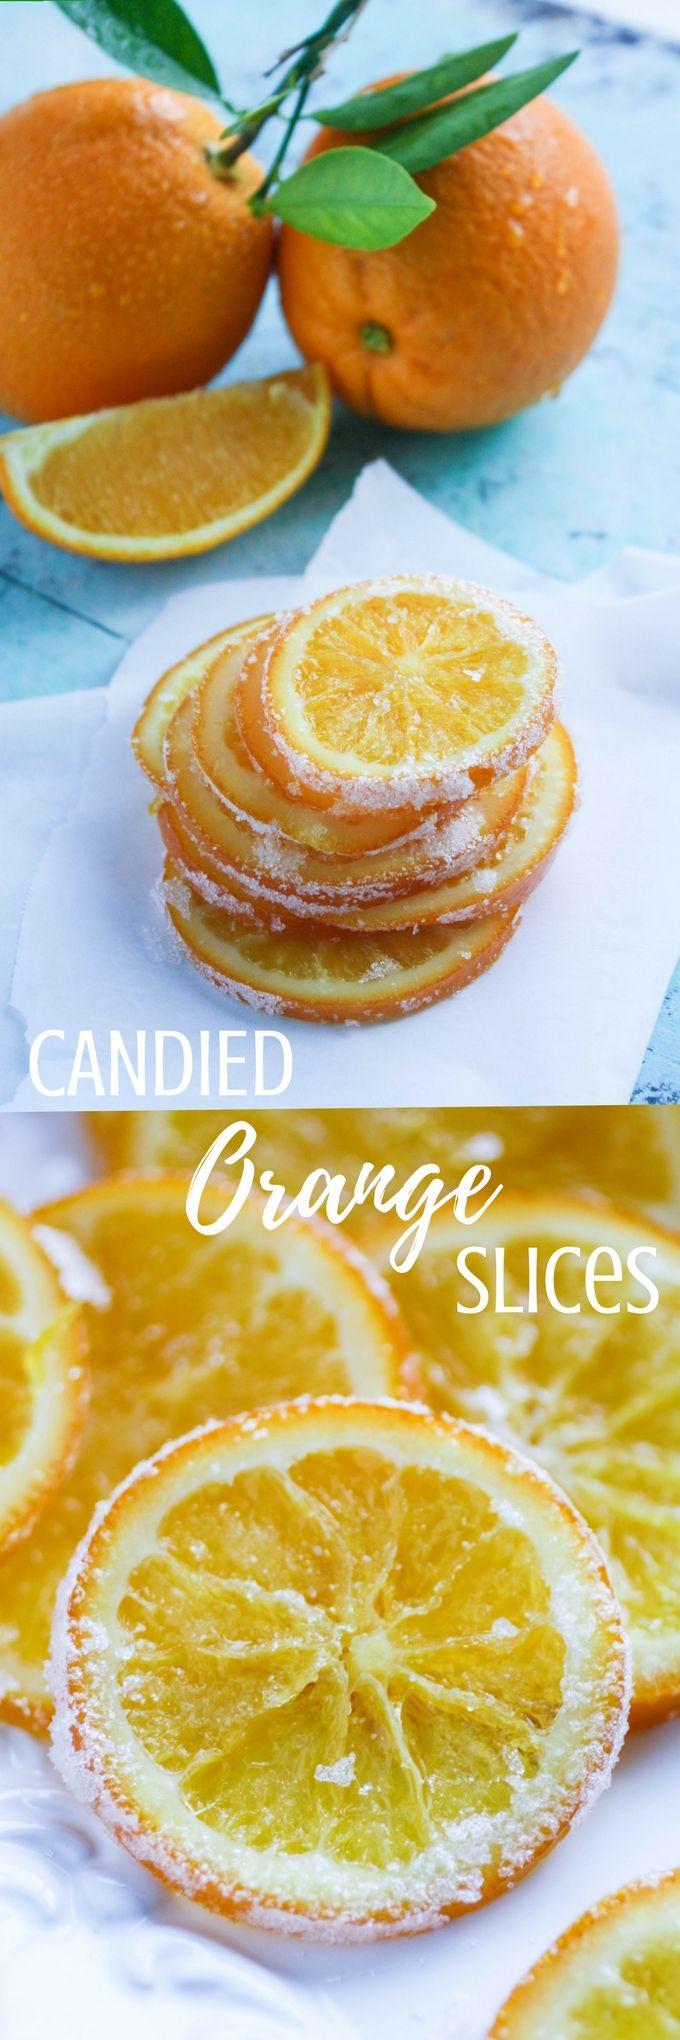 Candied Orange Slices are bright and delightful! You'll enjoy these candied orange slices on a dreary day! #treats #orange